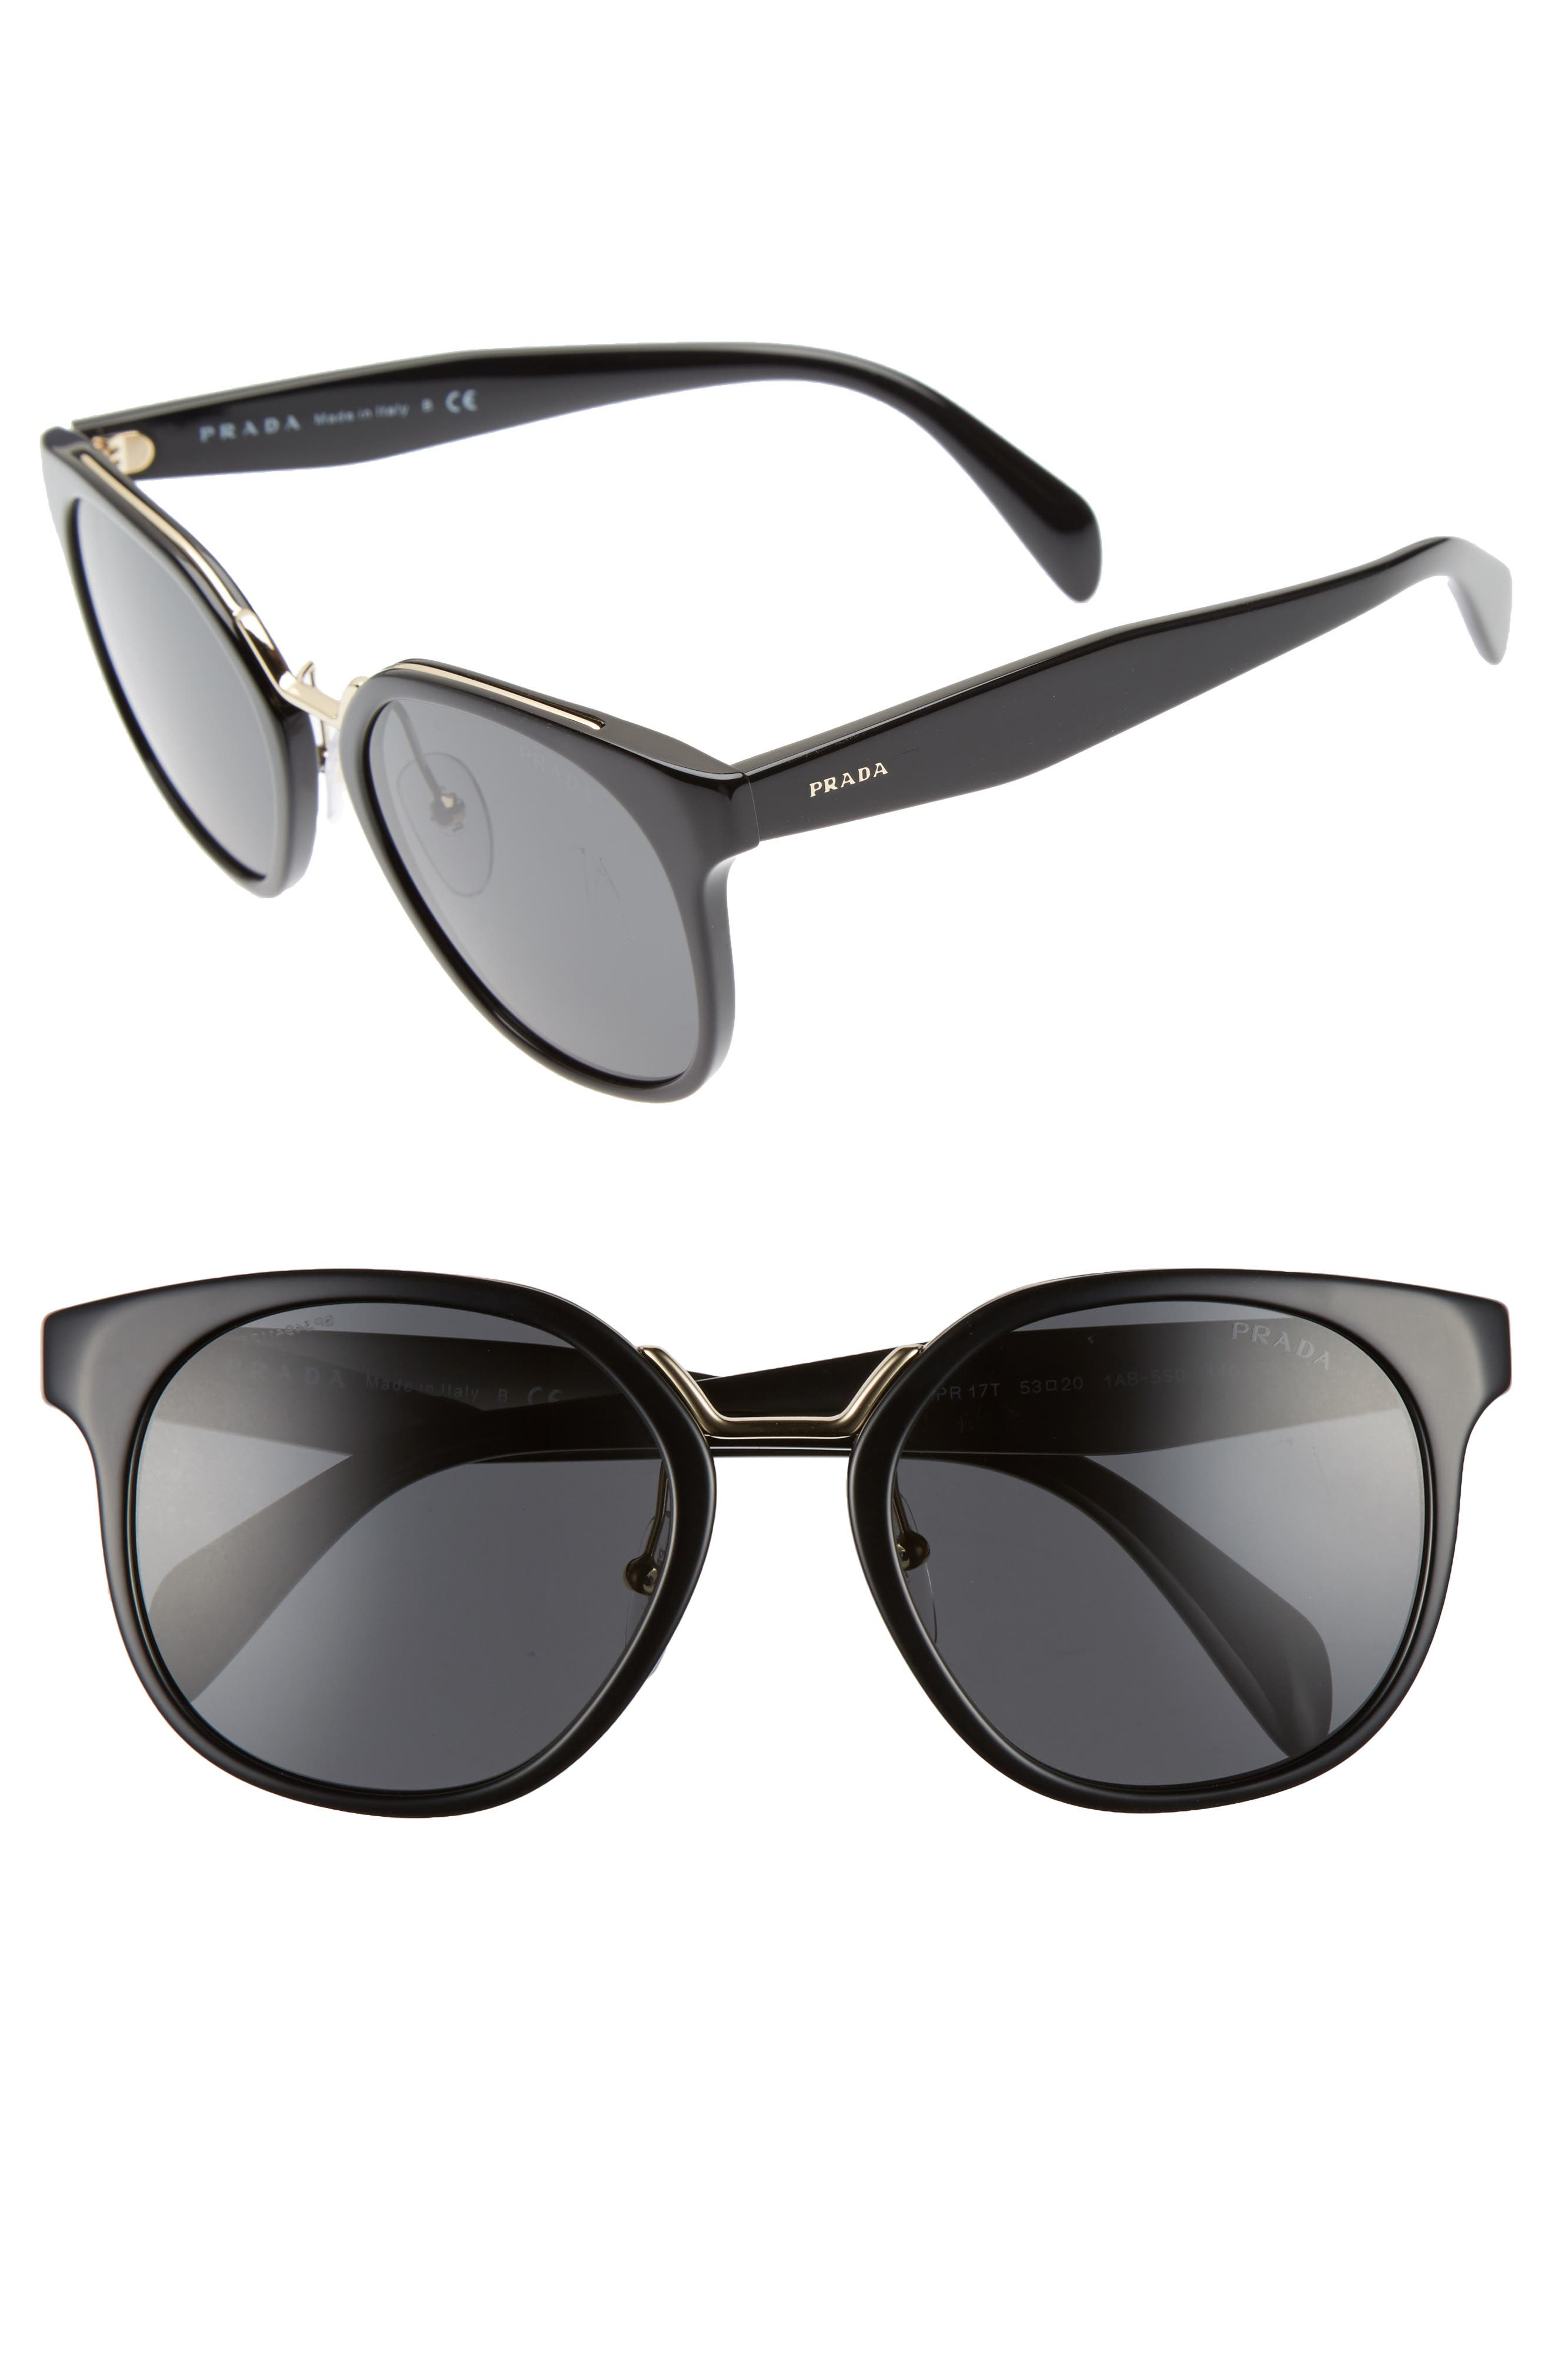 53mm Horn-Rimmed Sunglasses,                             Main thumbnail 1, color,                             020